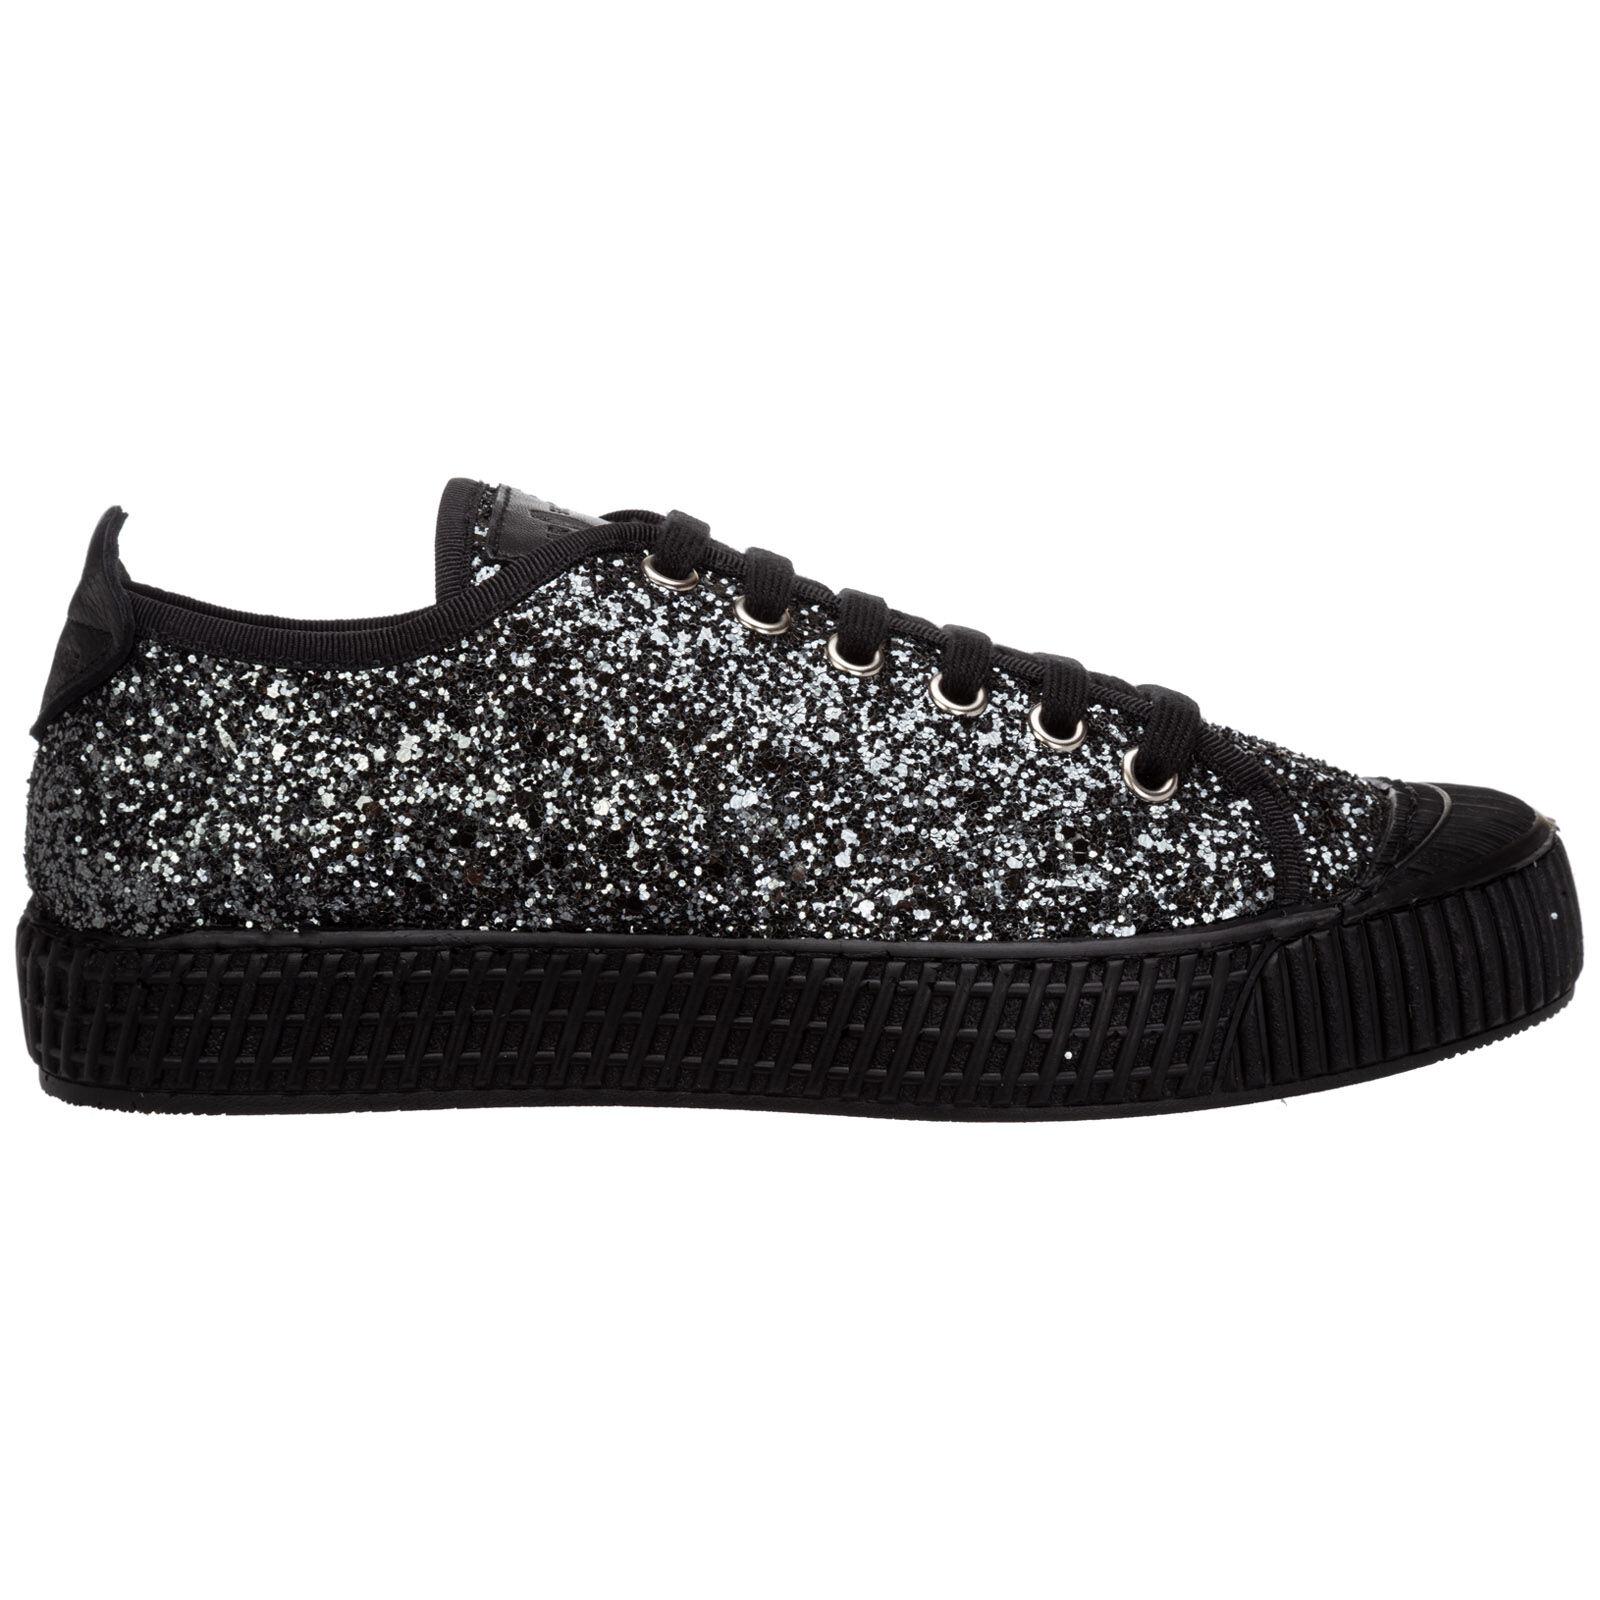 Car Shoe Women's shoes trainers sneakers  - Black - Size: 35